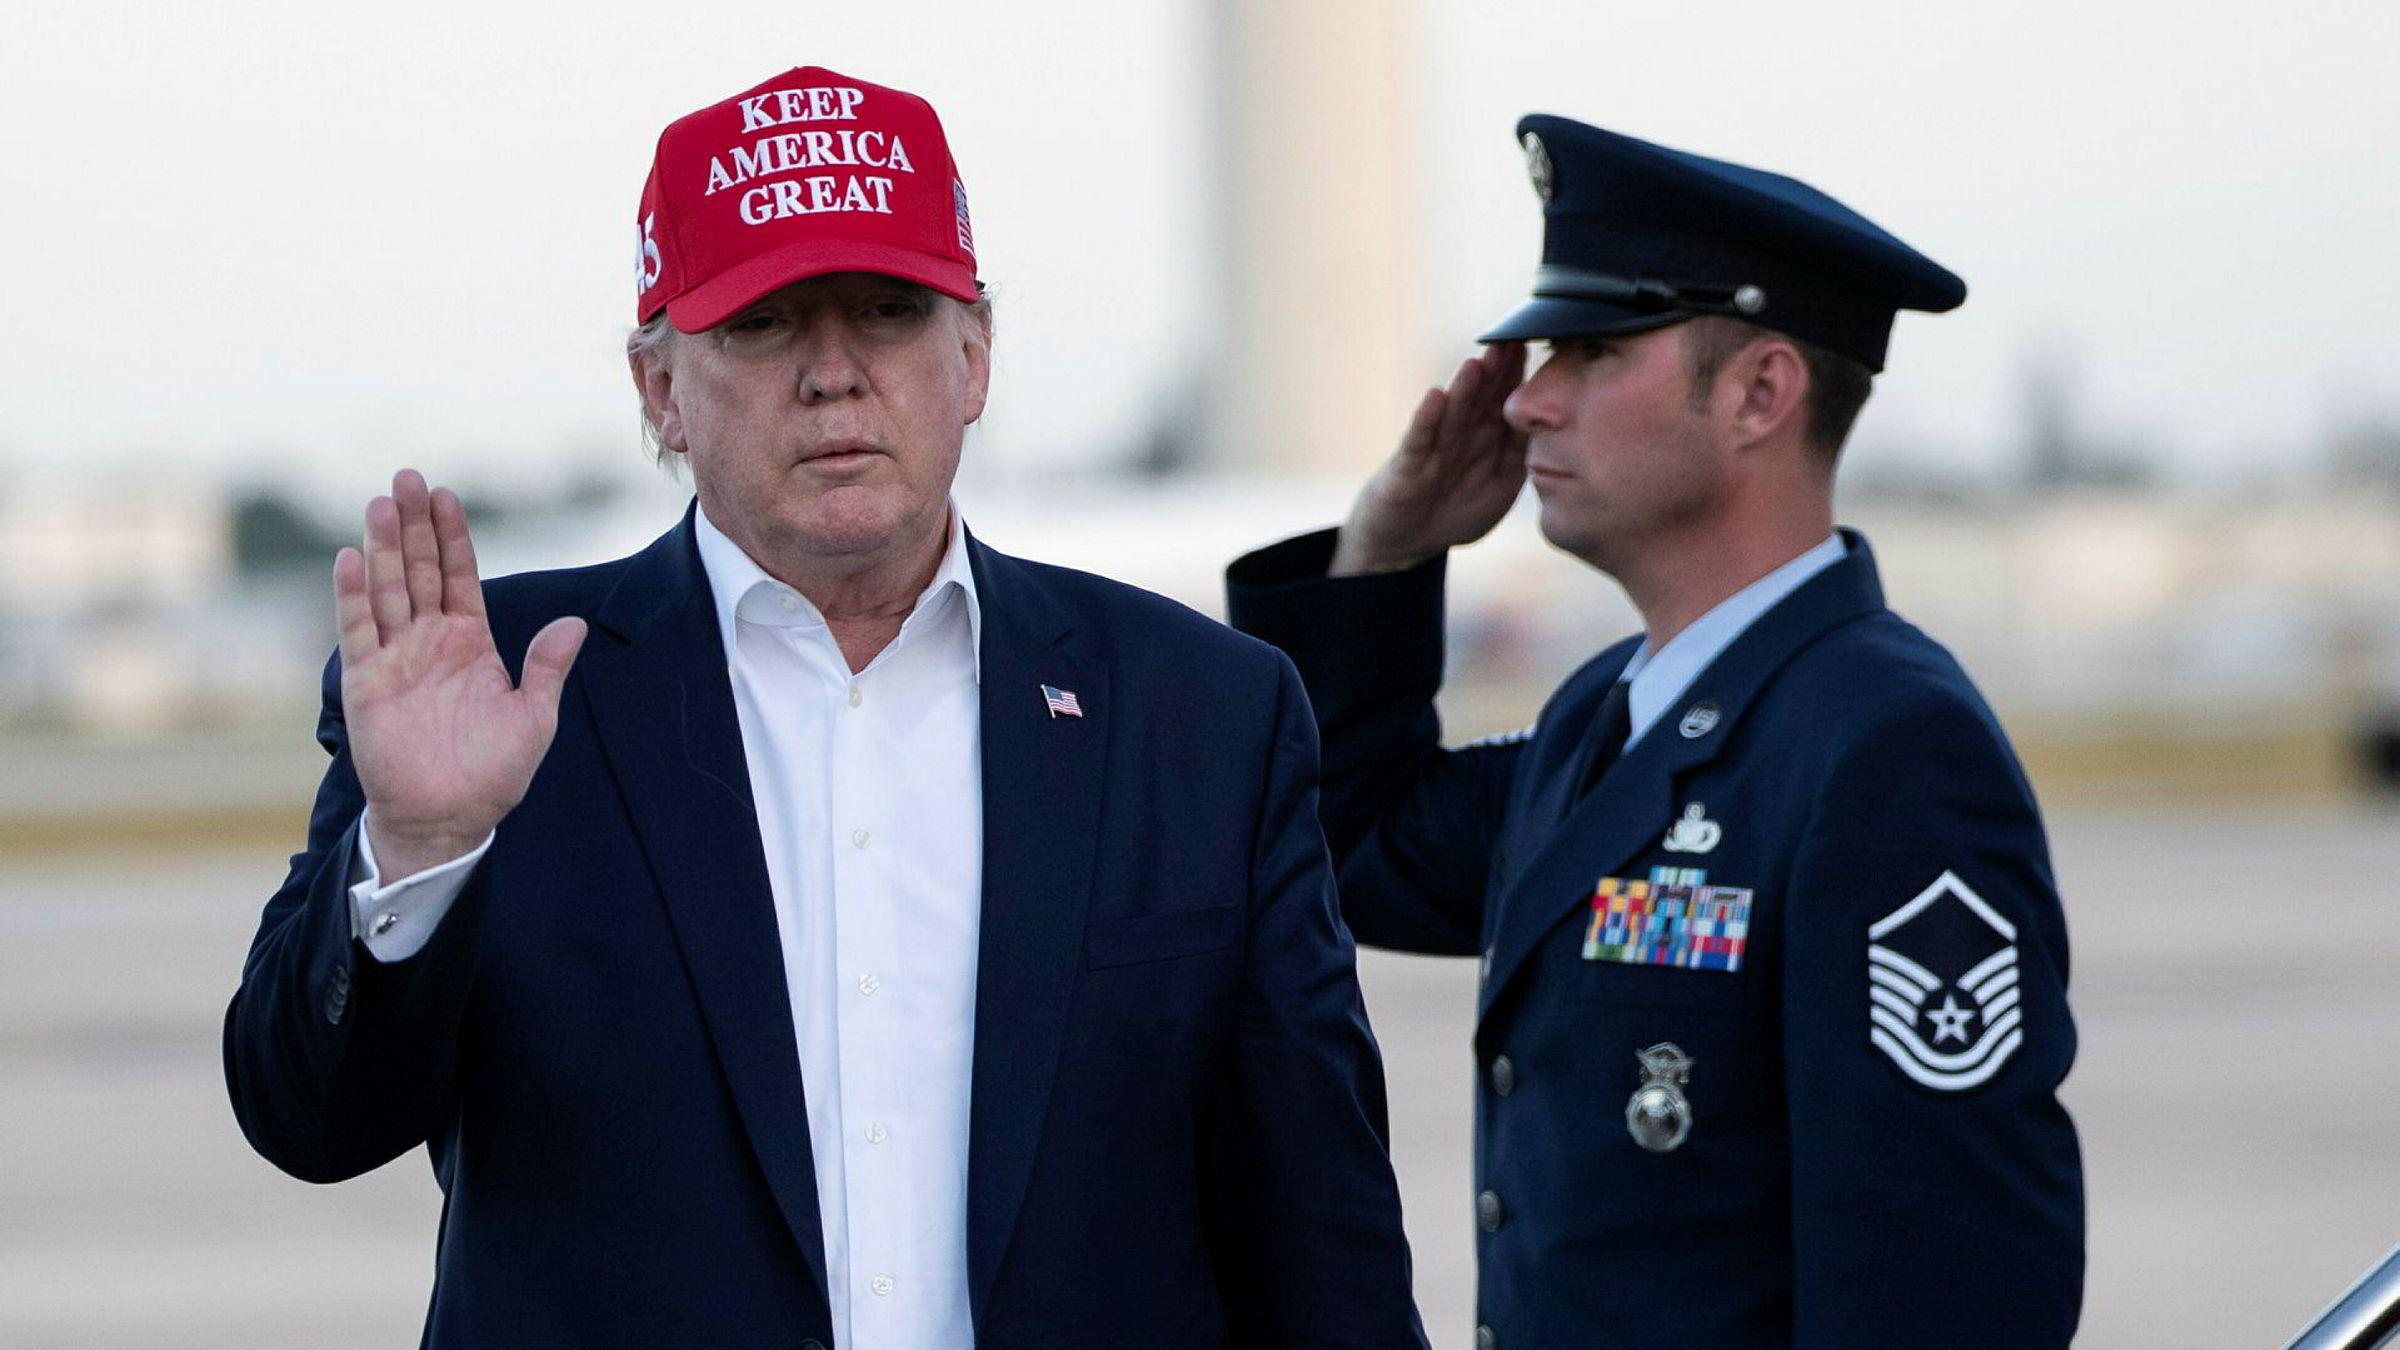 Donald Trump deltar ikke i kongresshøringene om riksrett mot ham som starter onsdag.